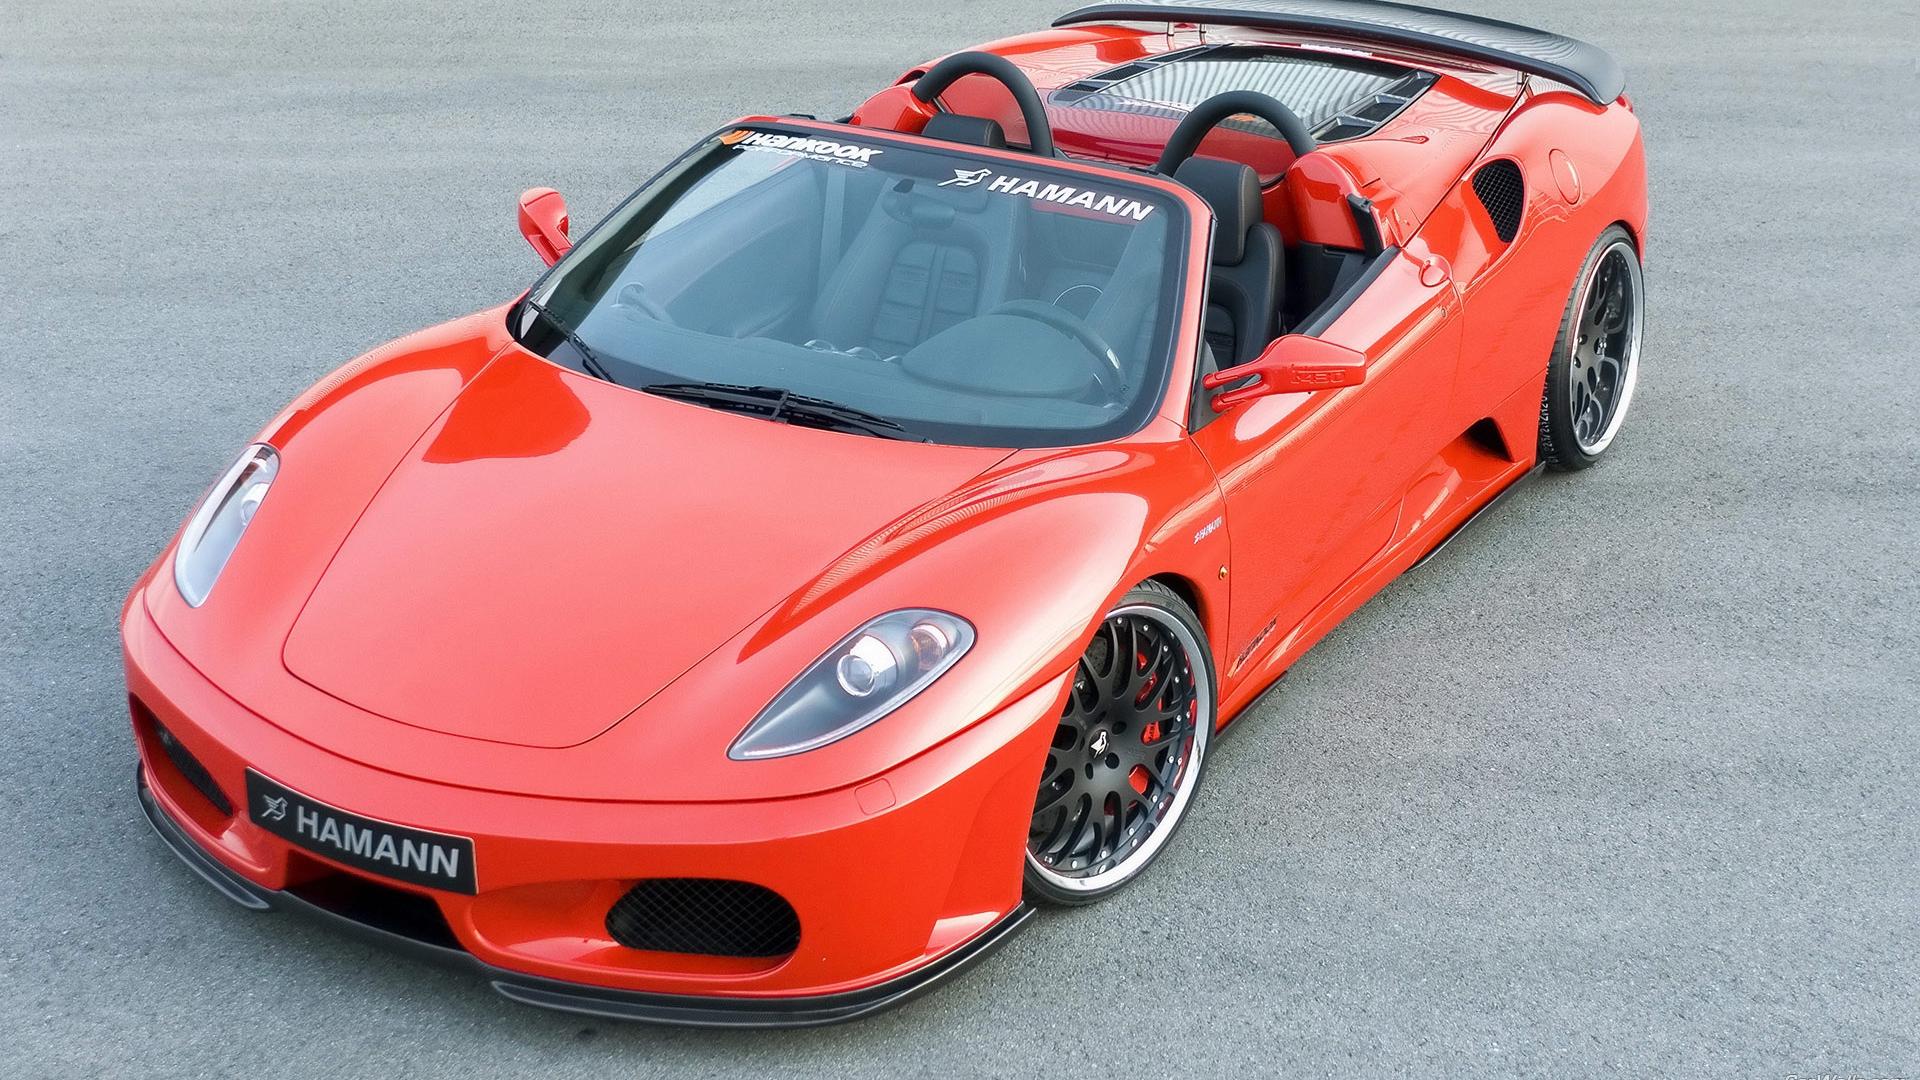 Ferrari F430 Tuning HD